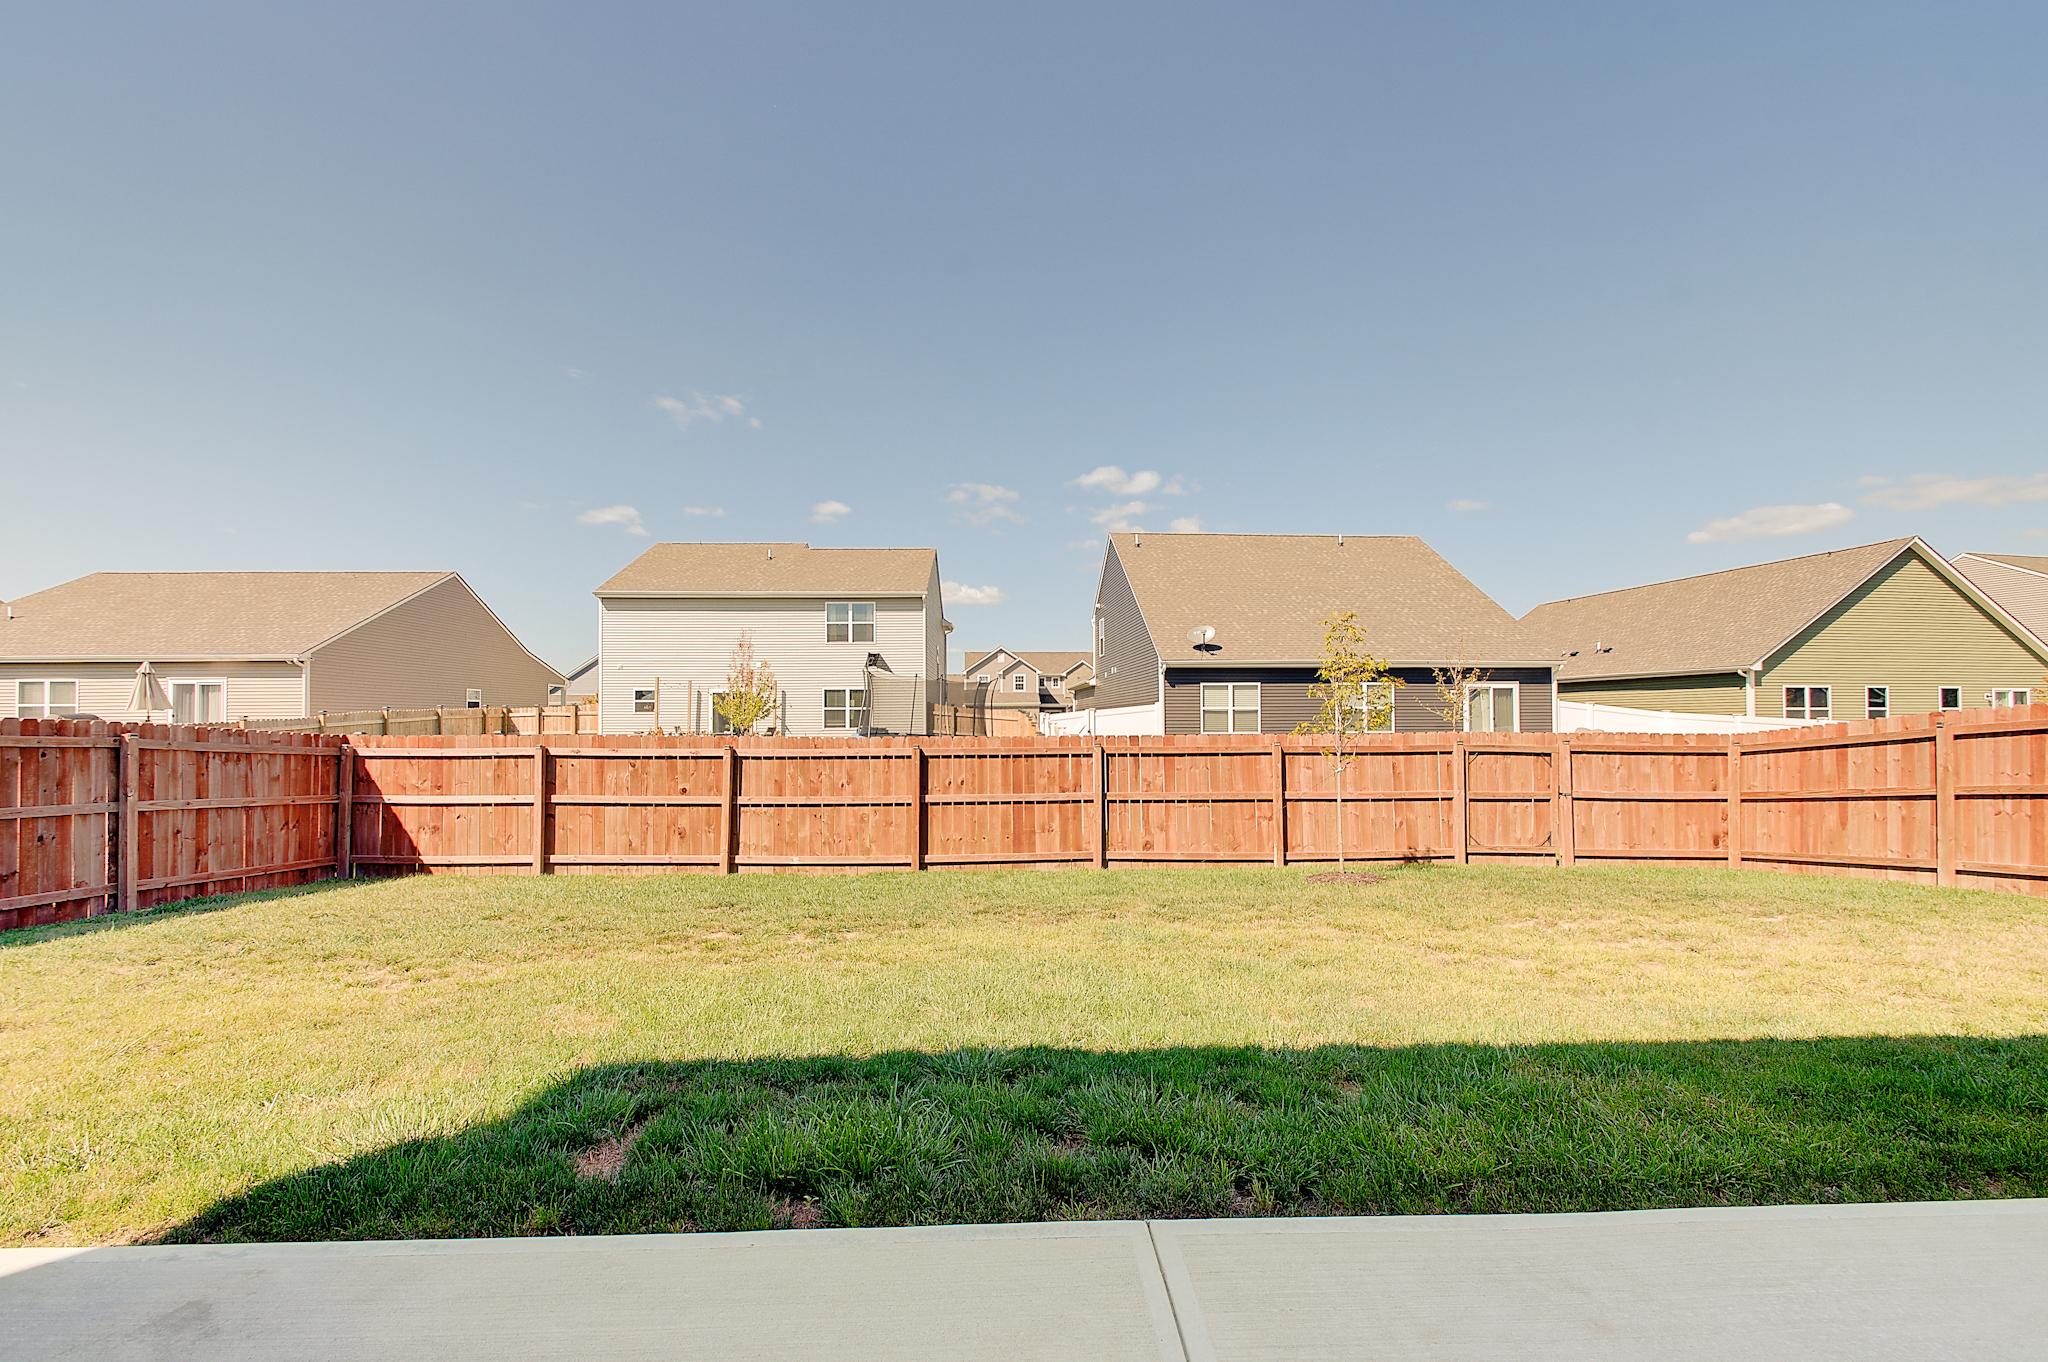 17-Rear-Yard-View-2.jpg